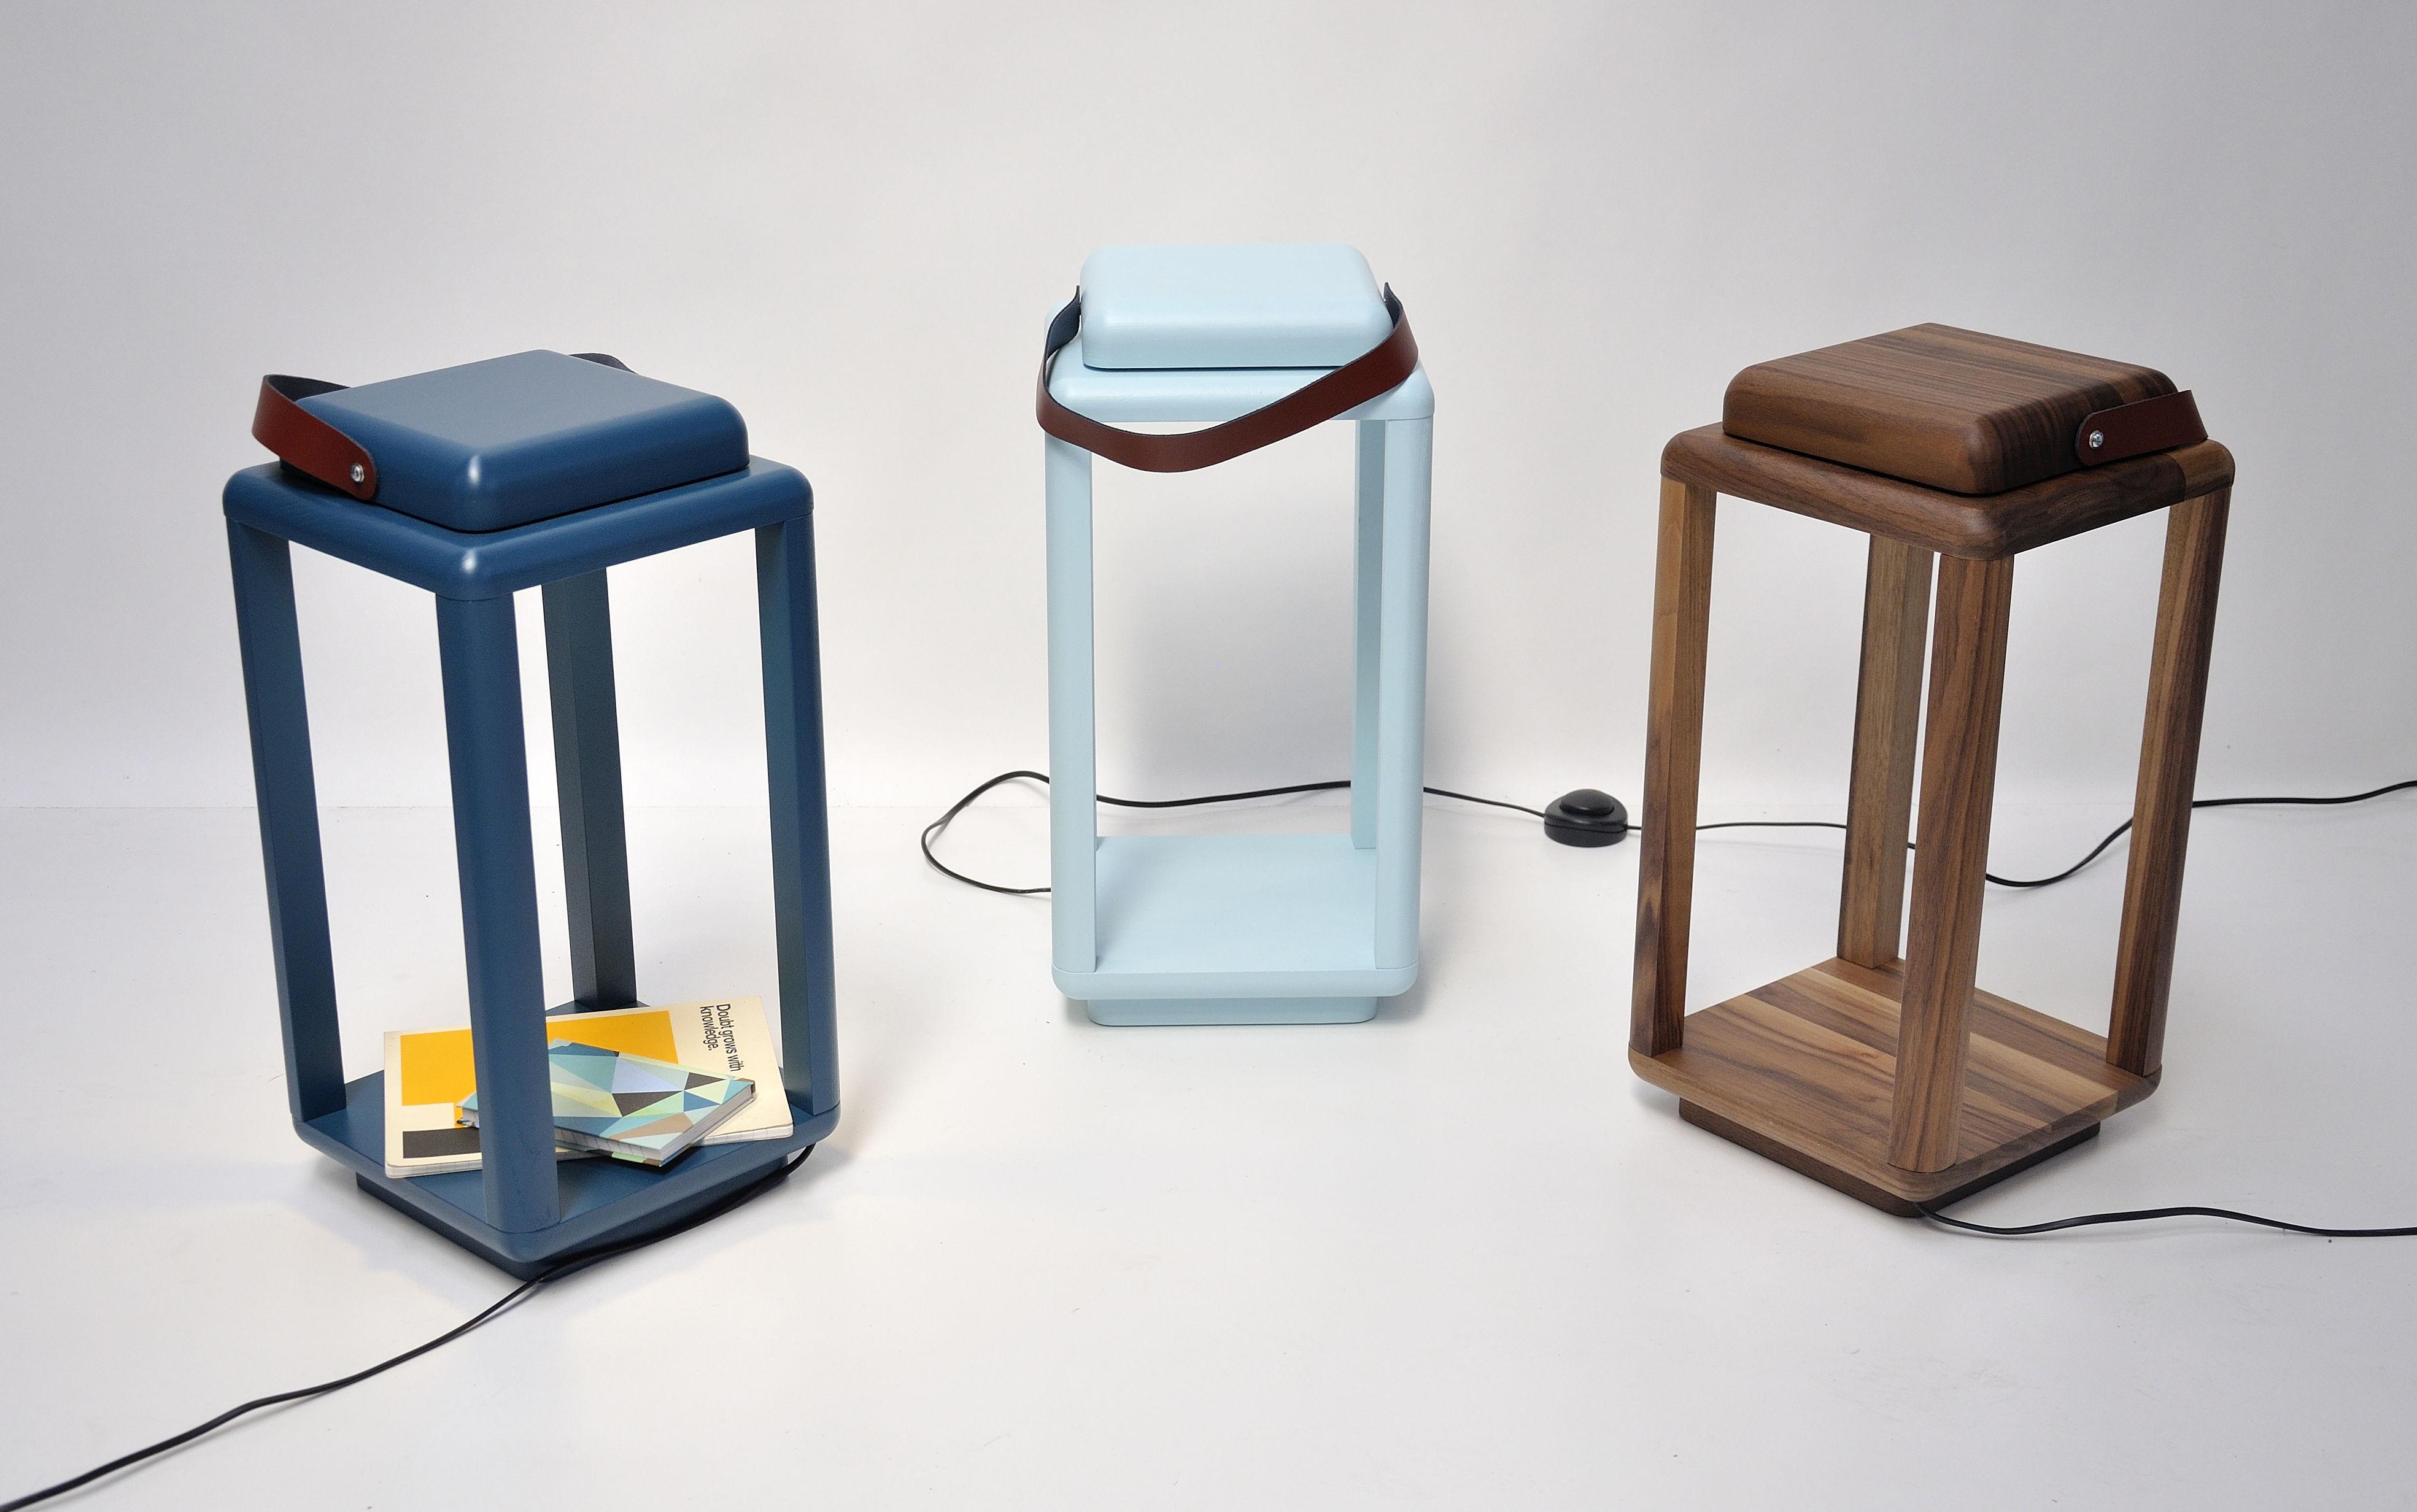 lampe nauset small led h 40 cm bleu canard cuir marron valsecchi 1918. Black Bedroom Furniture Sets. Home Design Ideas